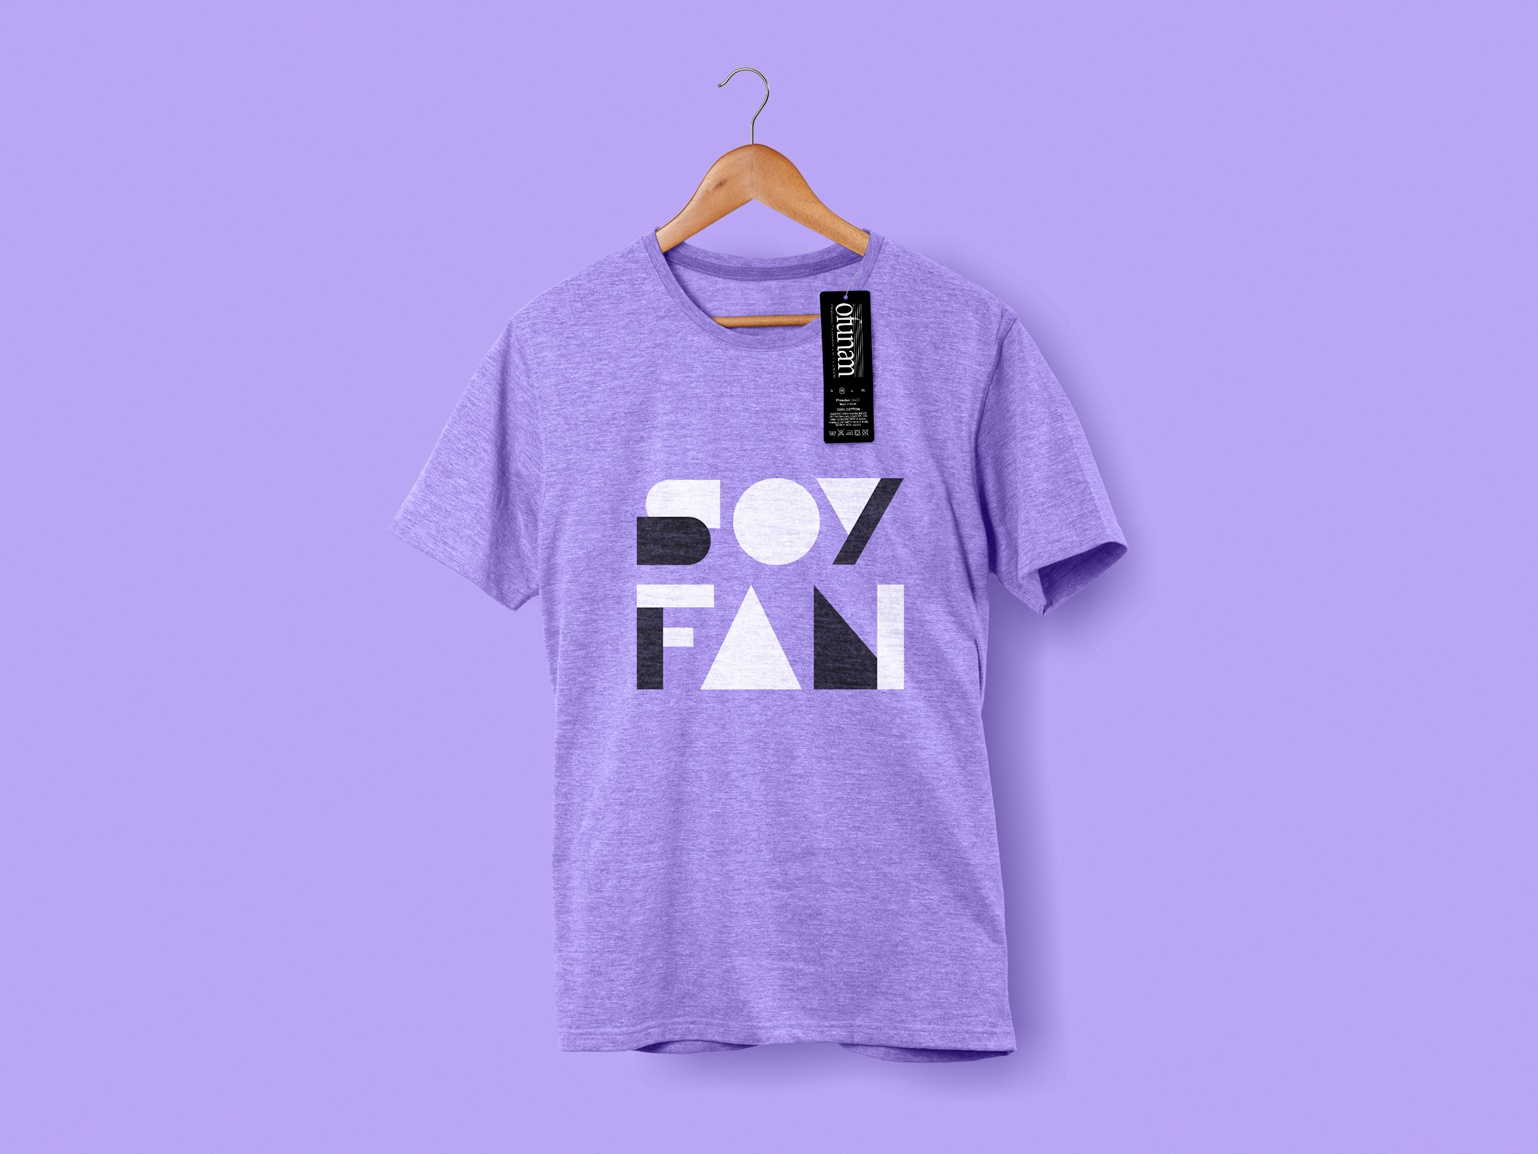 SOY FAN, Ofunam. T-Shirt logotipe logo typography shirt design branding